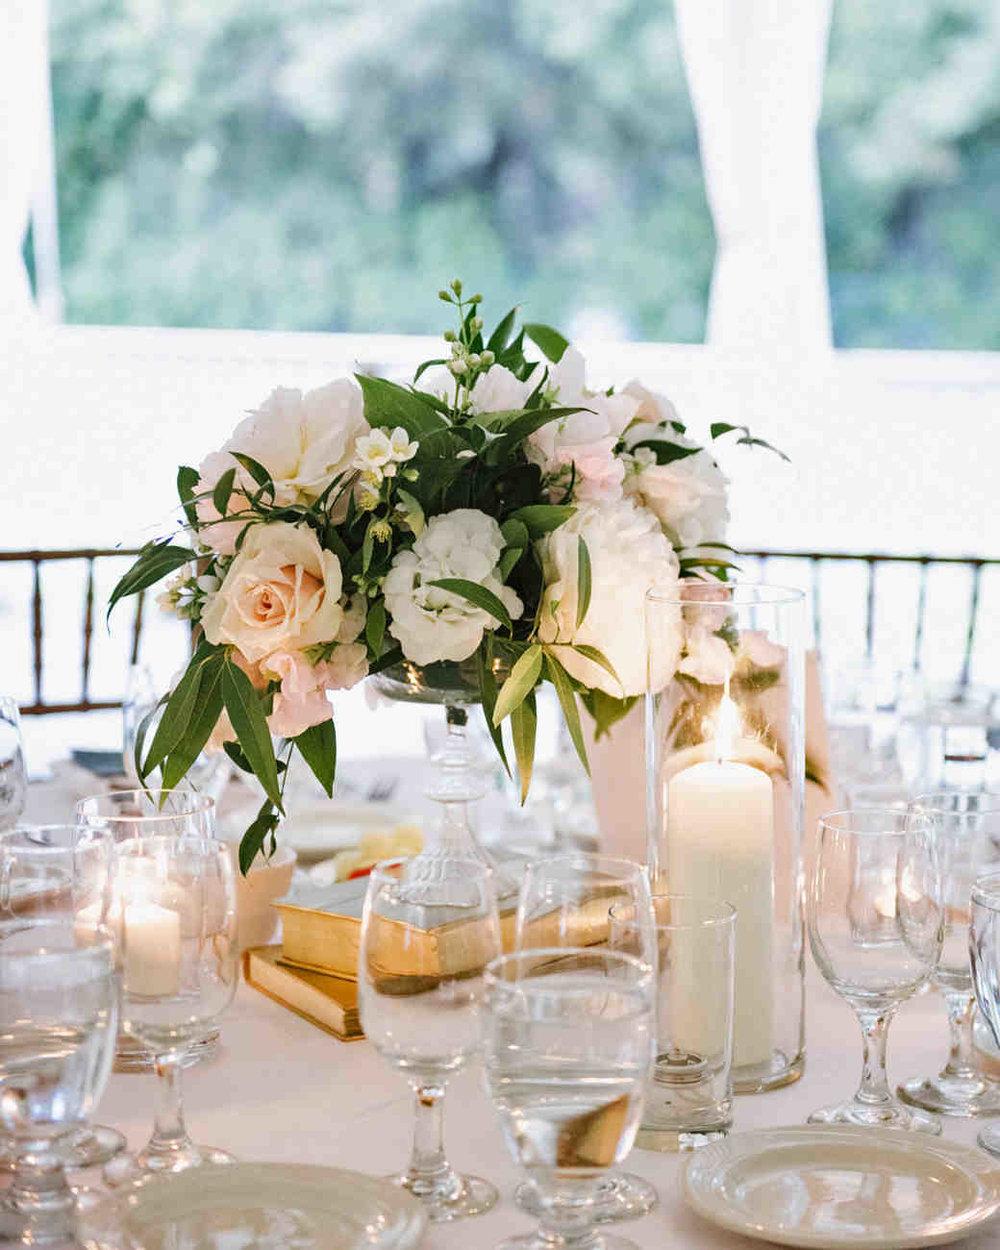 shannon-jon-wedding-centerpiece-0657-6238579-0117_vert.jpg